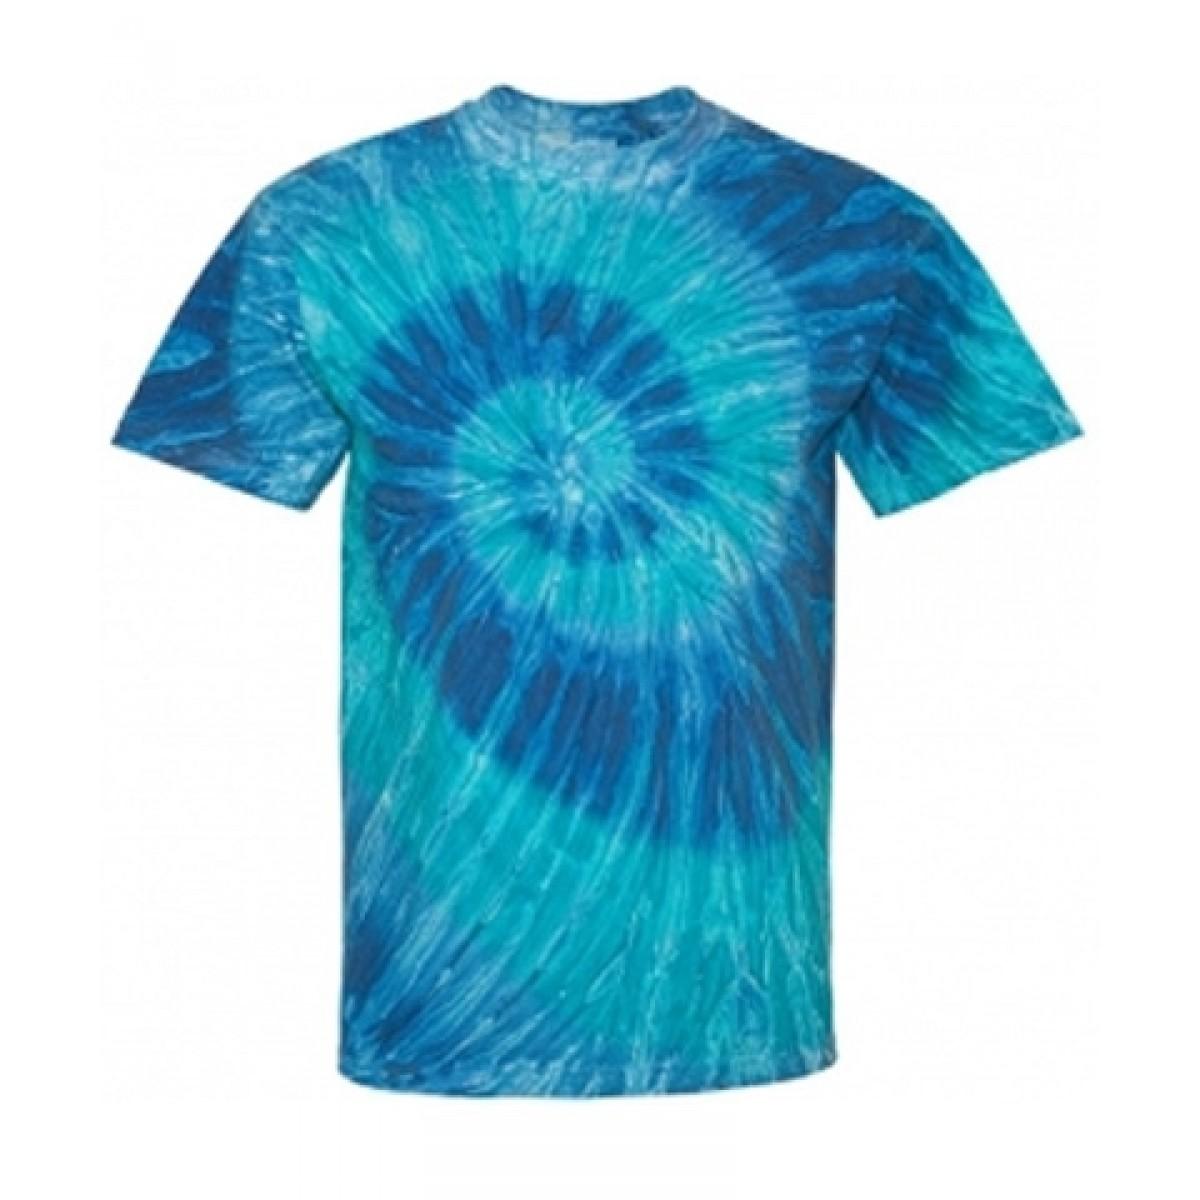 Blue or Black Ripple Tie Dye T-Shirt-Scuba Blue -M